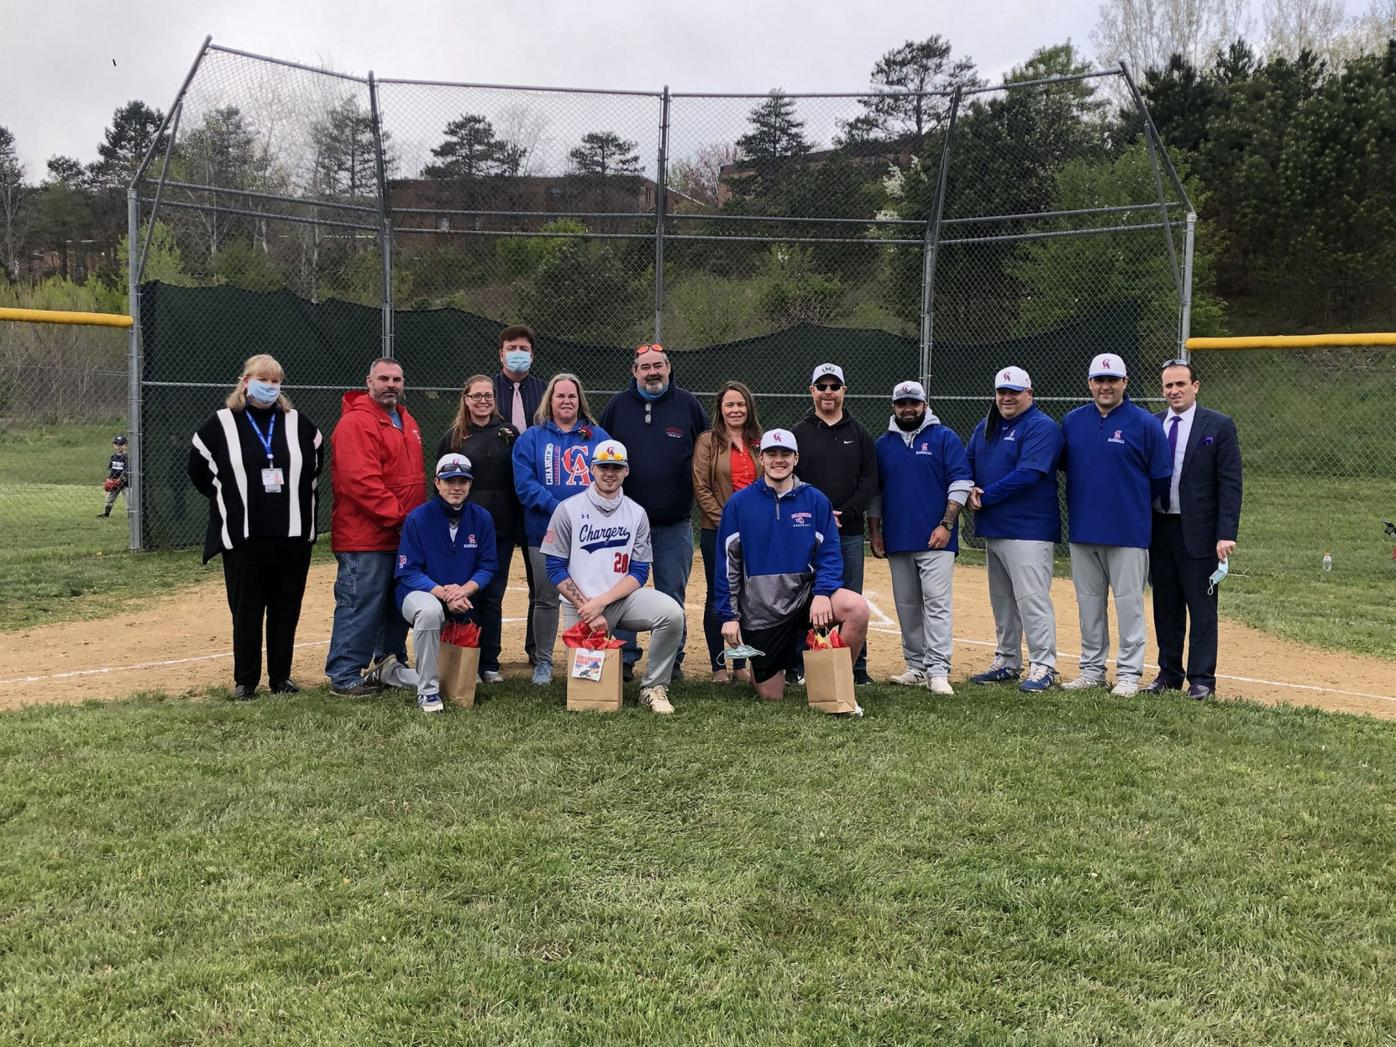 Carbondale Area celebrated Senior Night for the baseball team